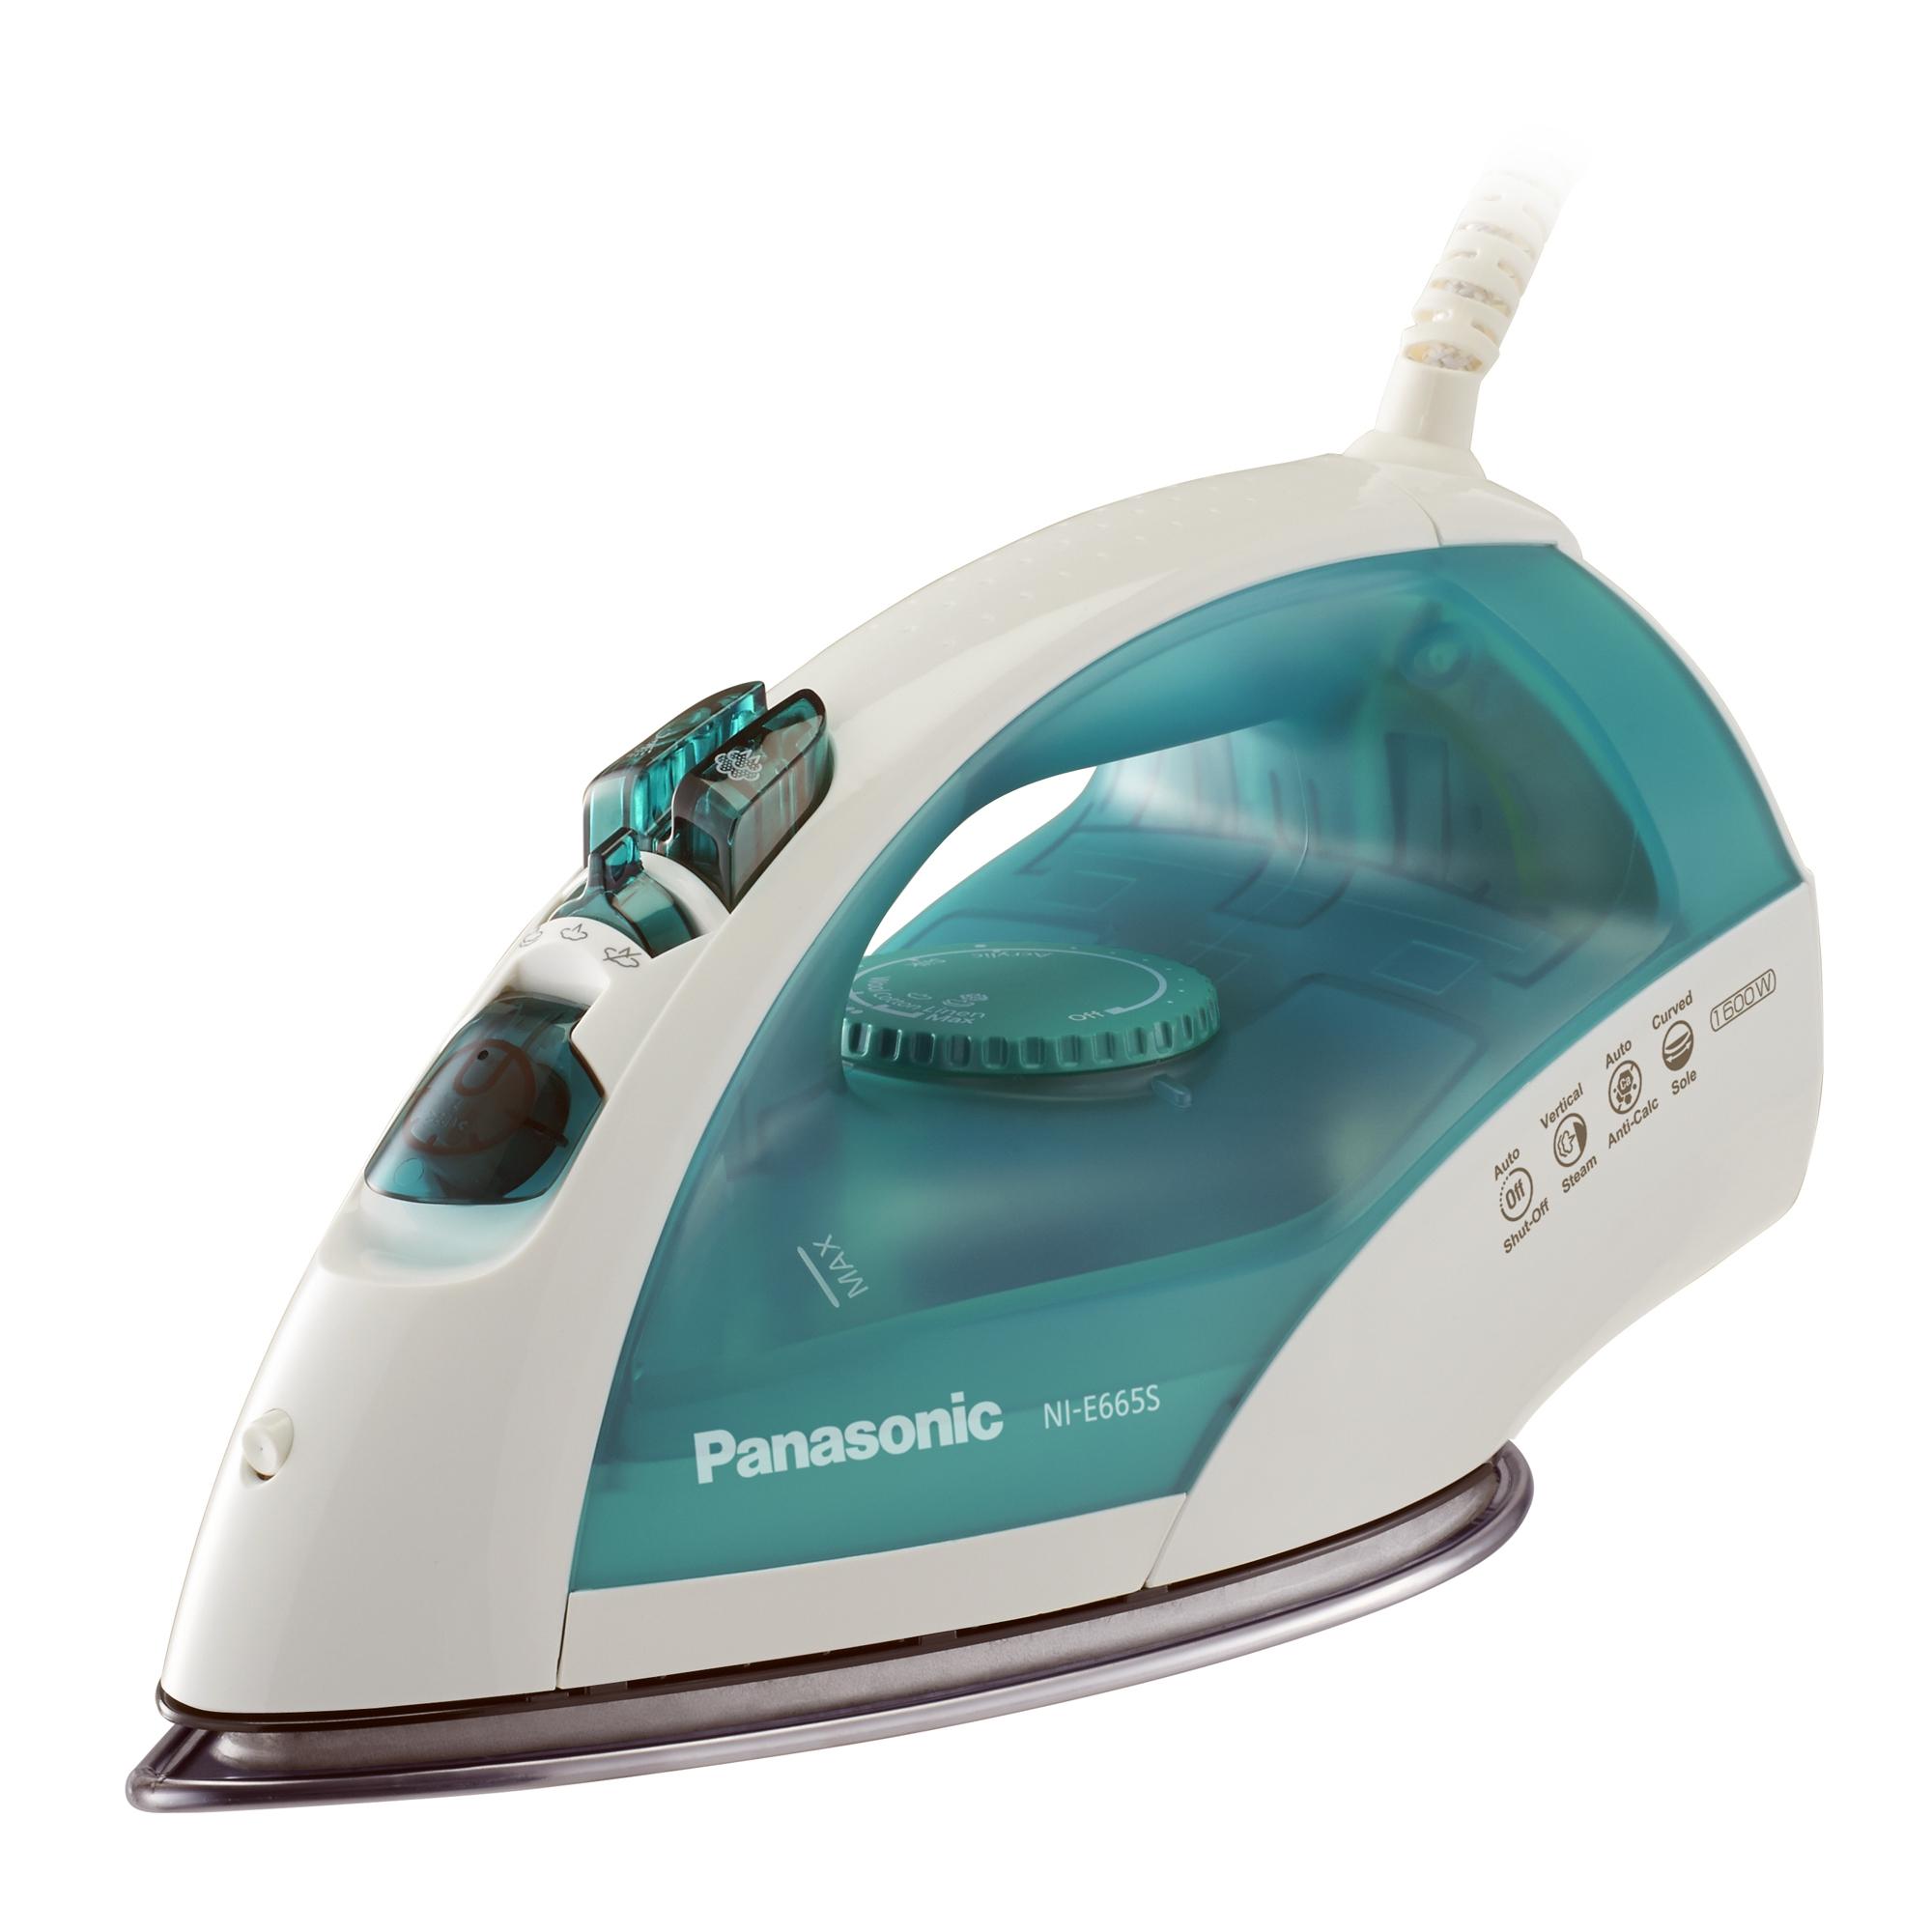 Panasonic 1700 Watt Steam and Dry Iron with U-Shape Titanium Curved Circulating Soleplate